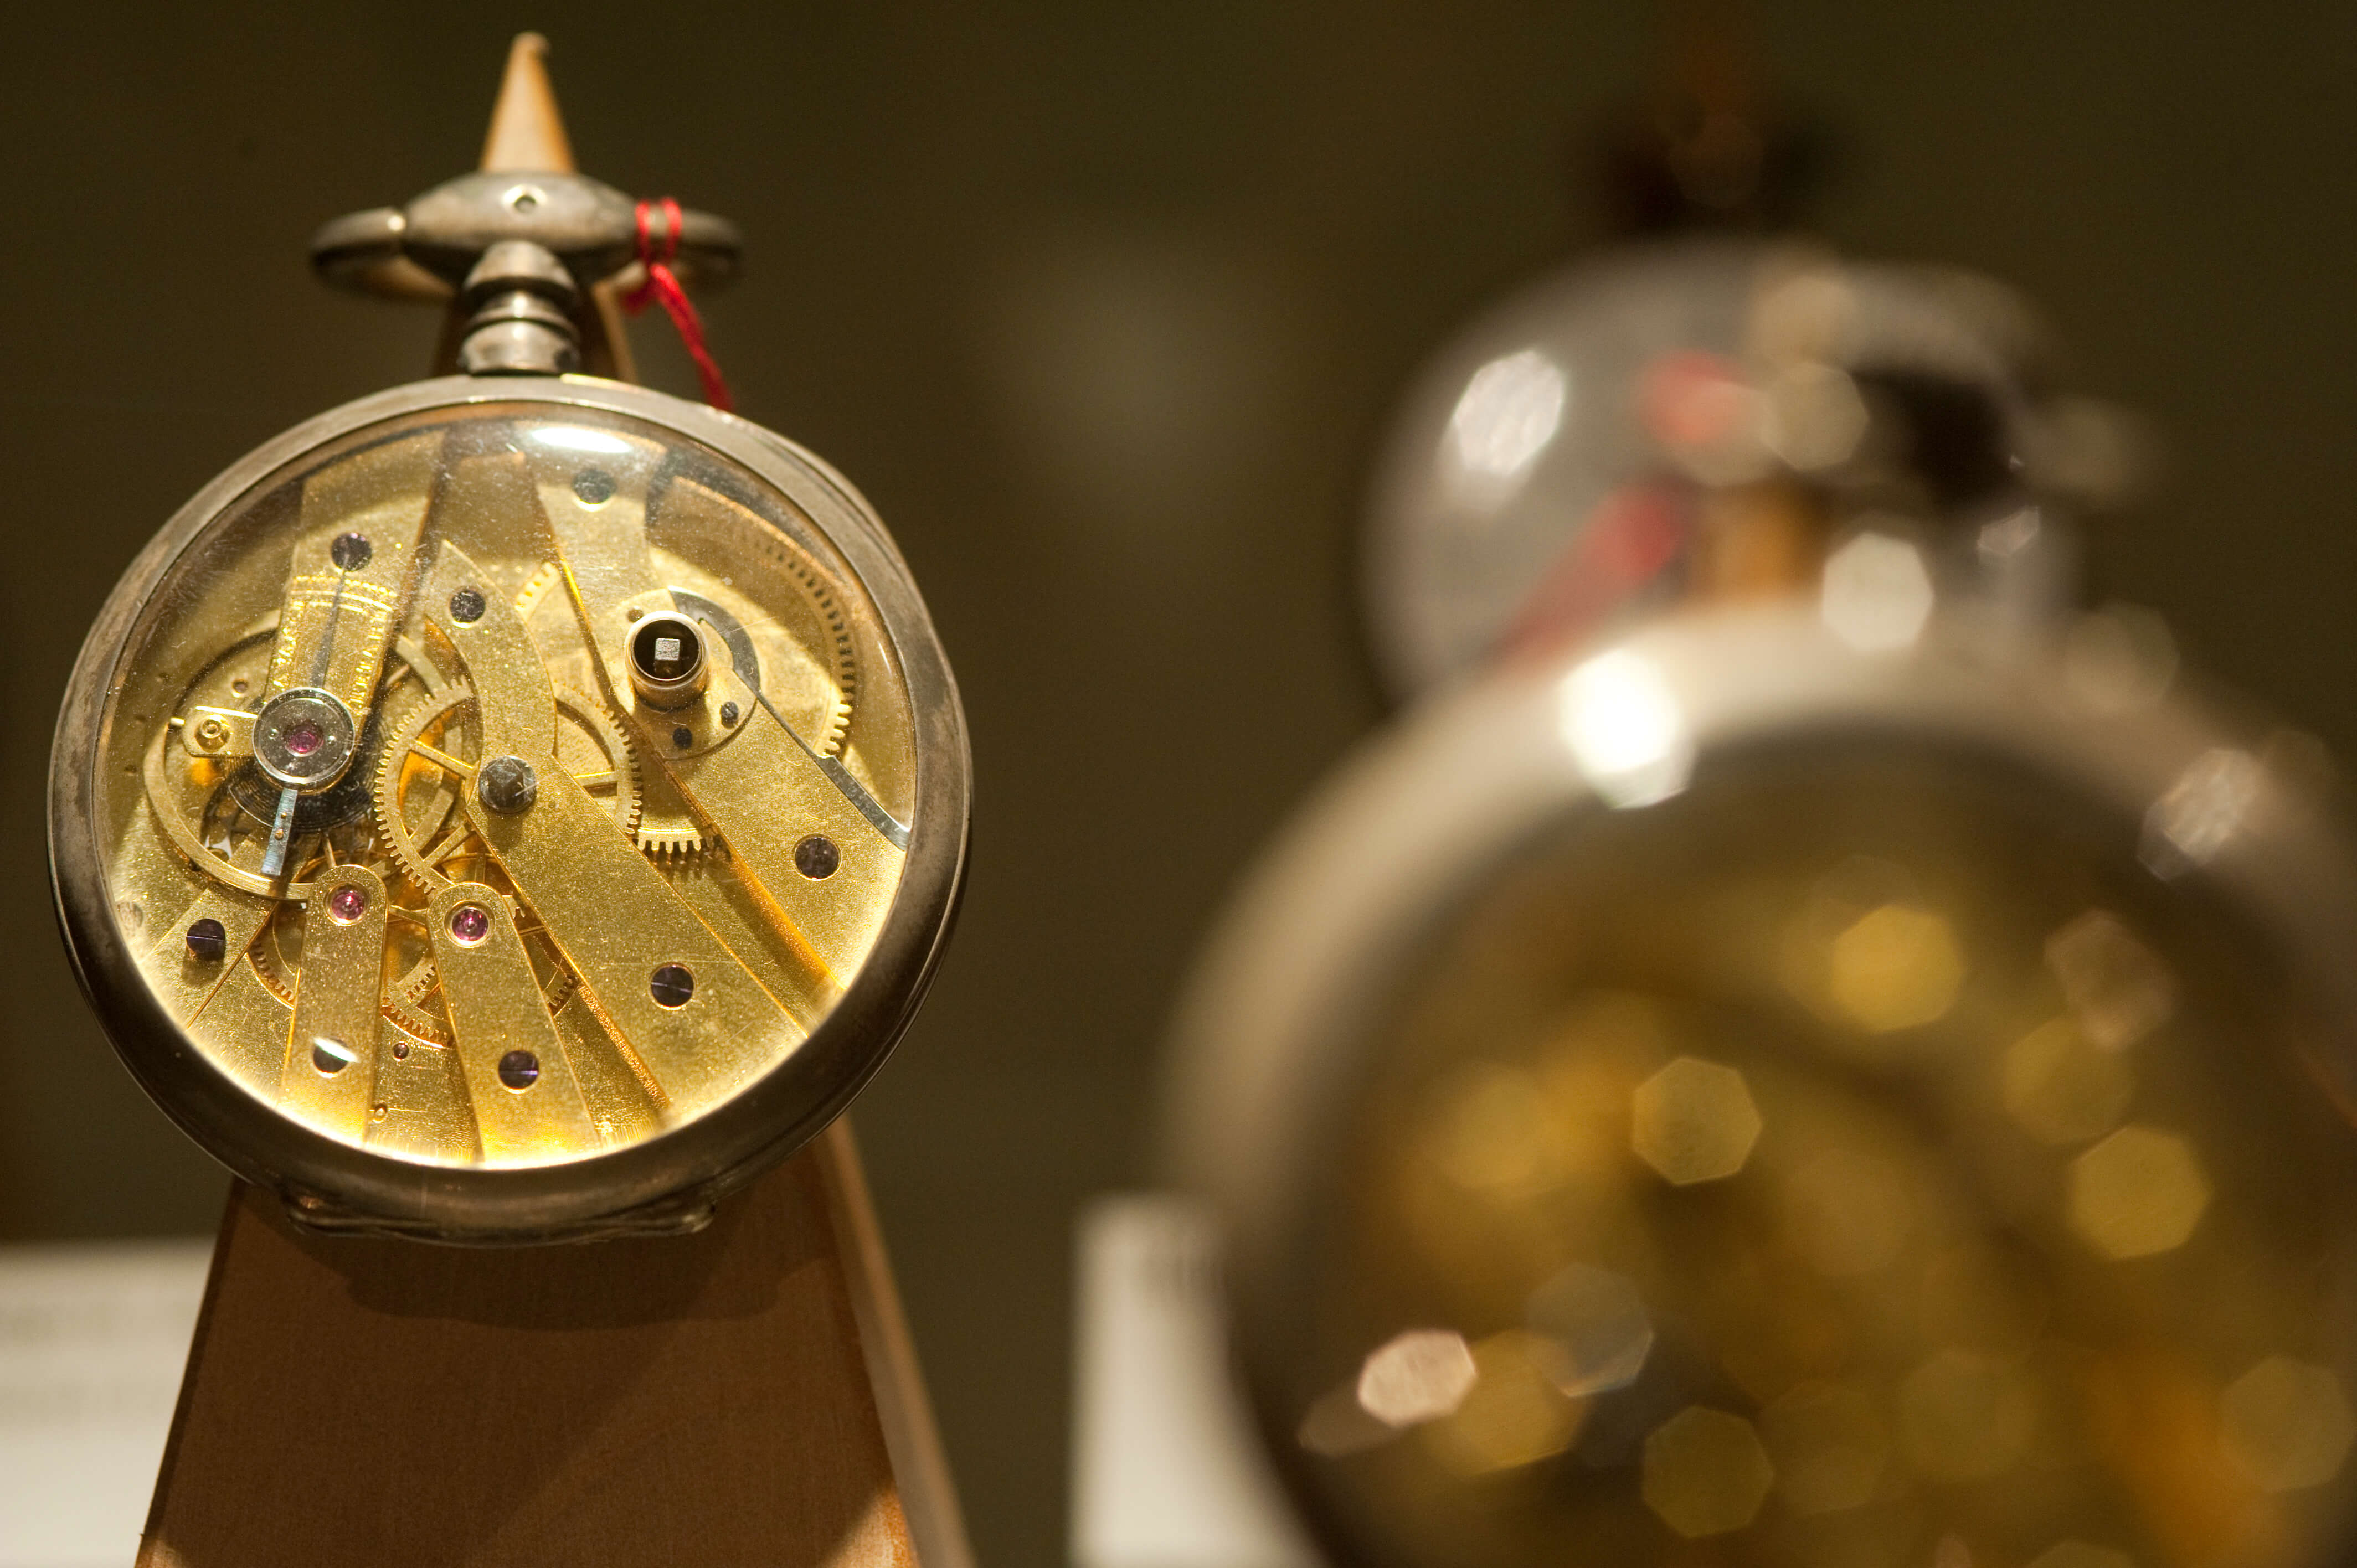 musee-horlogerie-decolletage-cluses-5